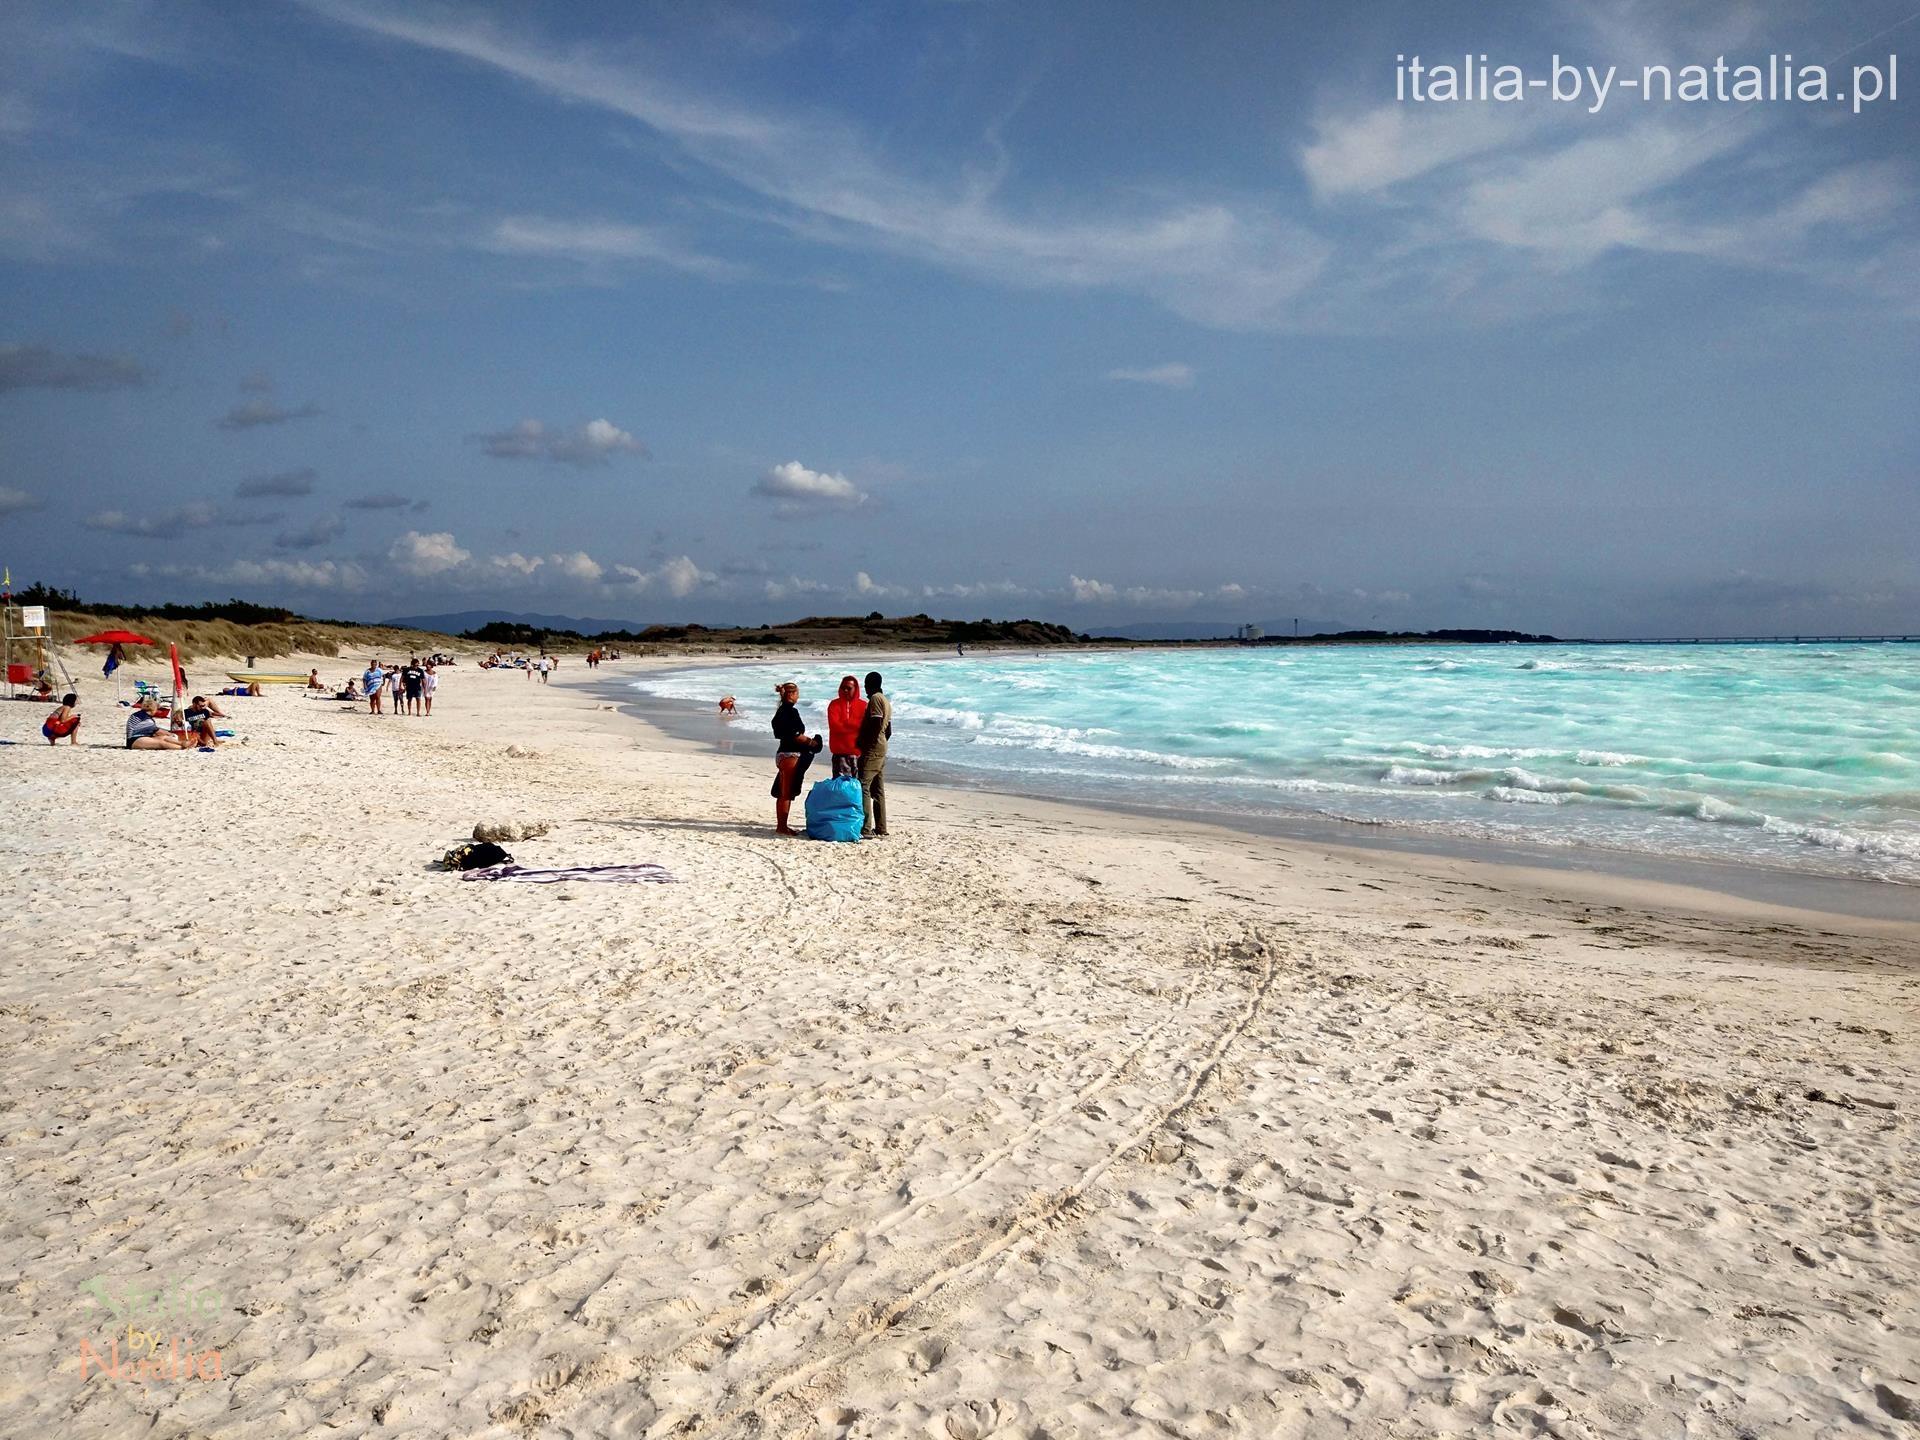 Vada Rosignano Solvay biała plaża Toskania